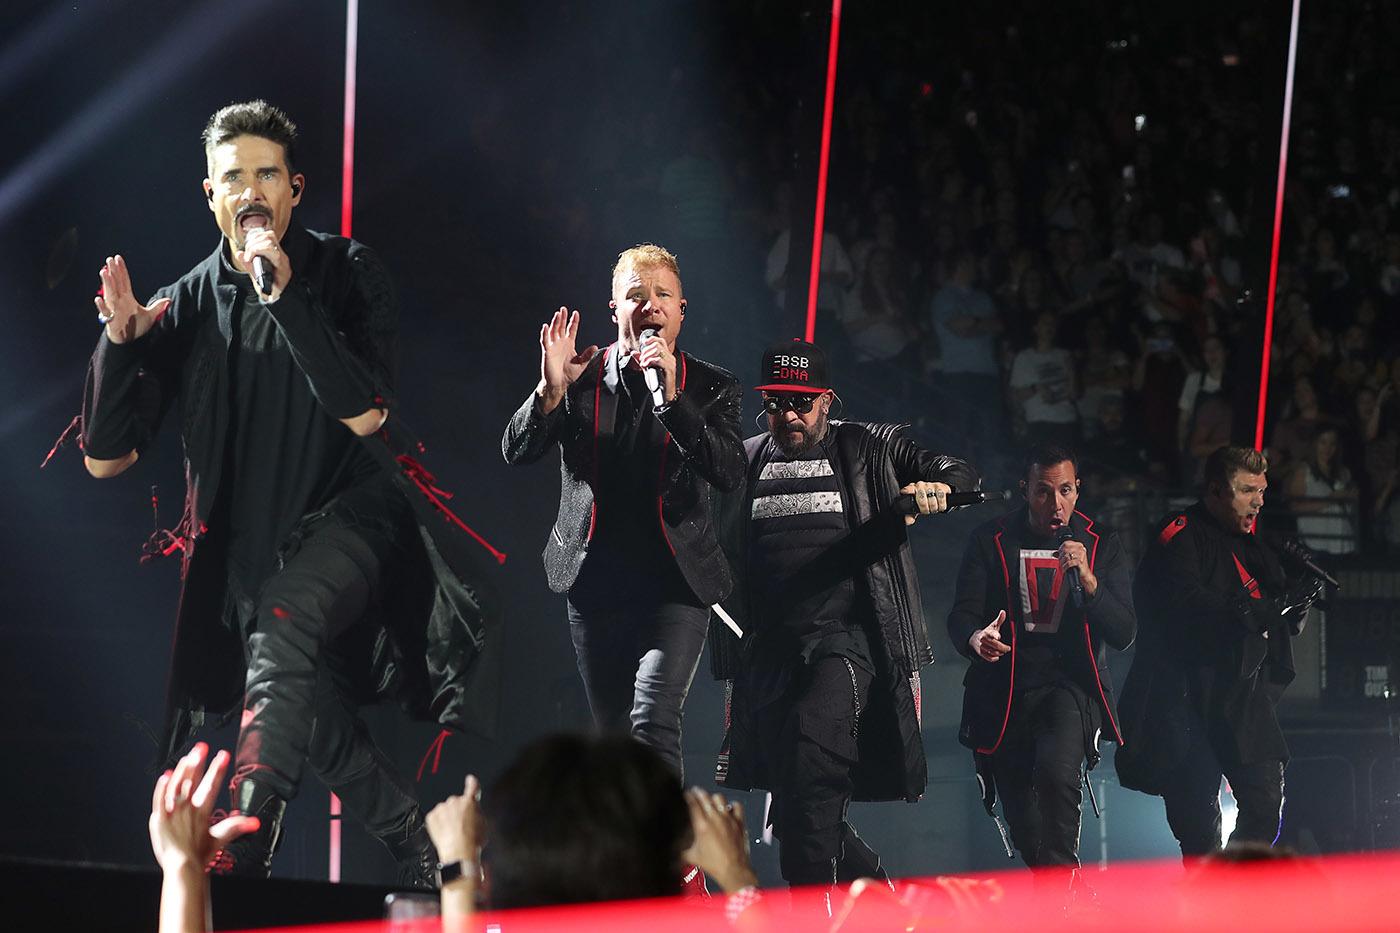 The Backstreet Boys perform at Vivint Smart Home Arena on Aug. 7, 2019.